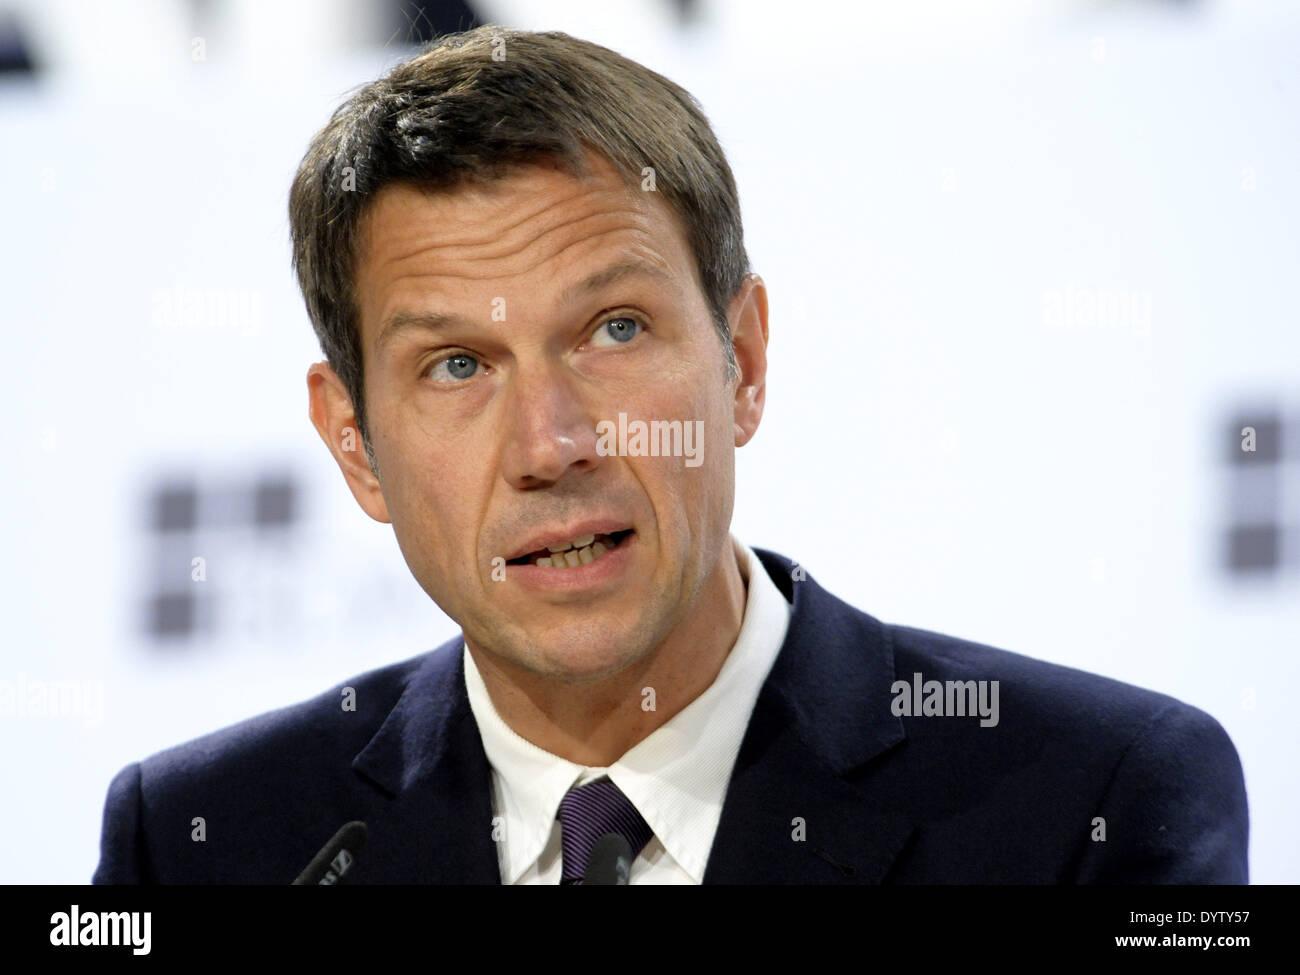 Rene Obermann Stock Photo